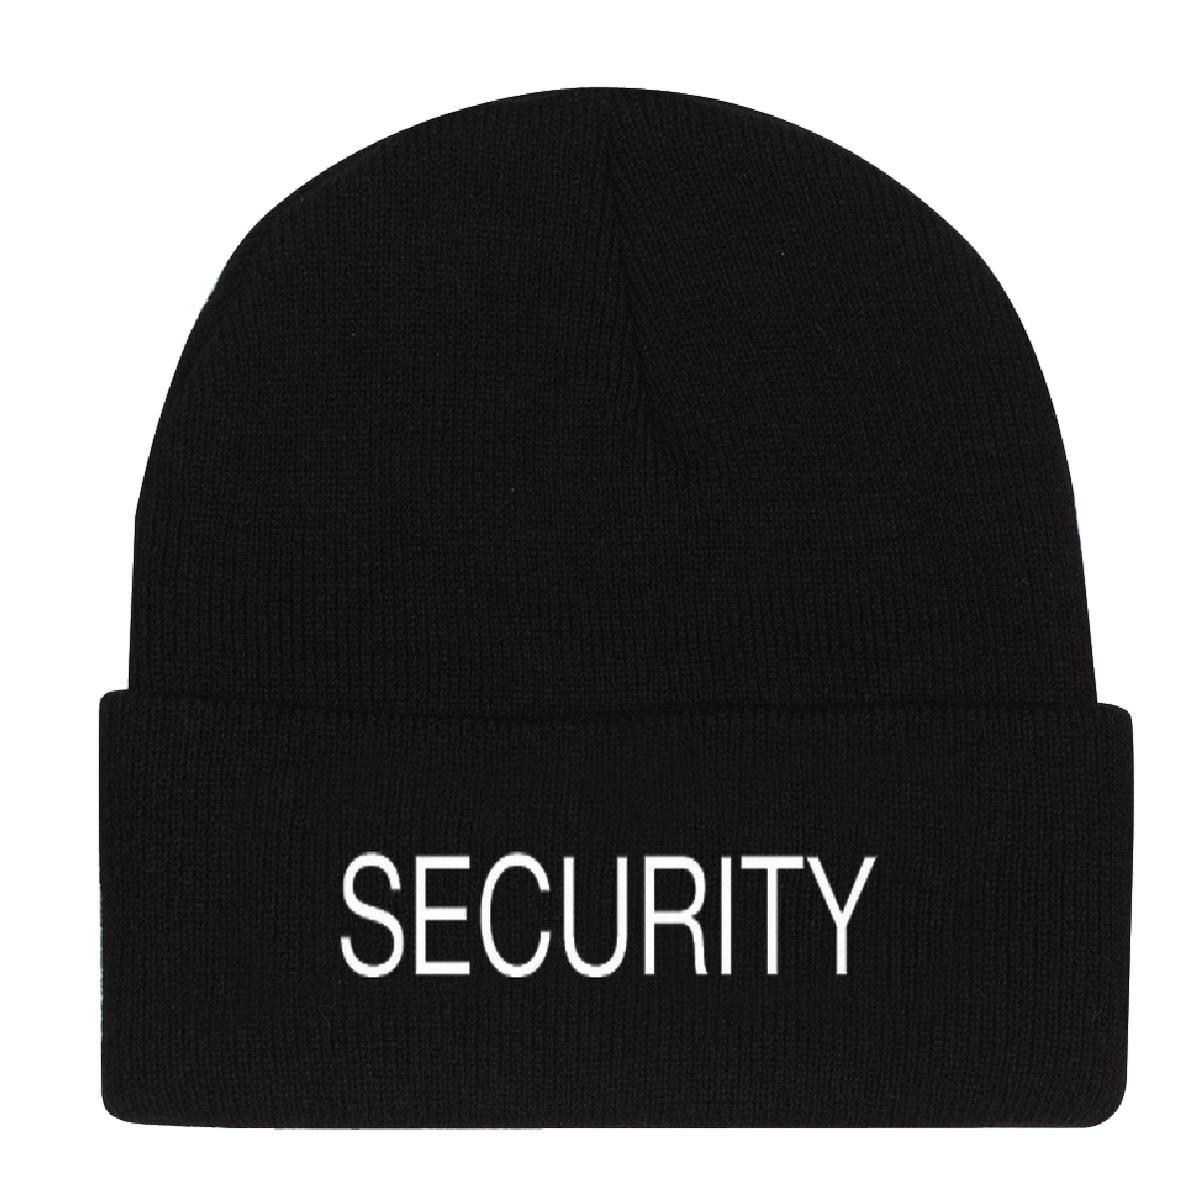 Embroidered Security Knit Watch Cap - Walmart.com 1d477469d